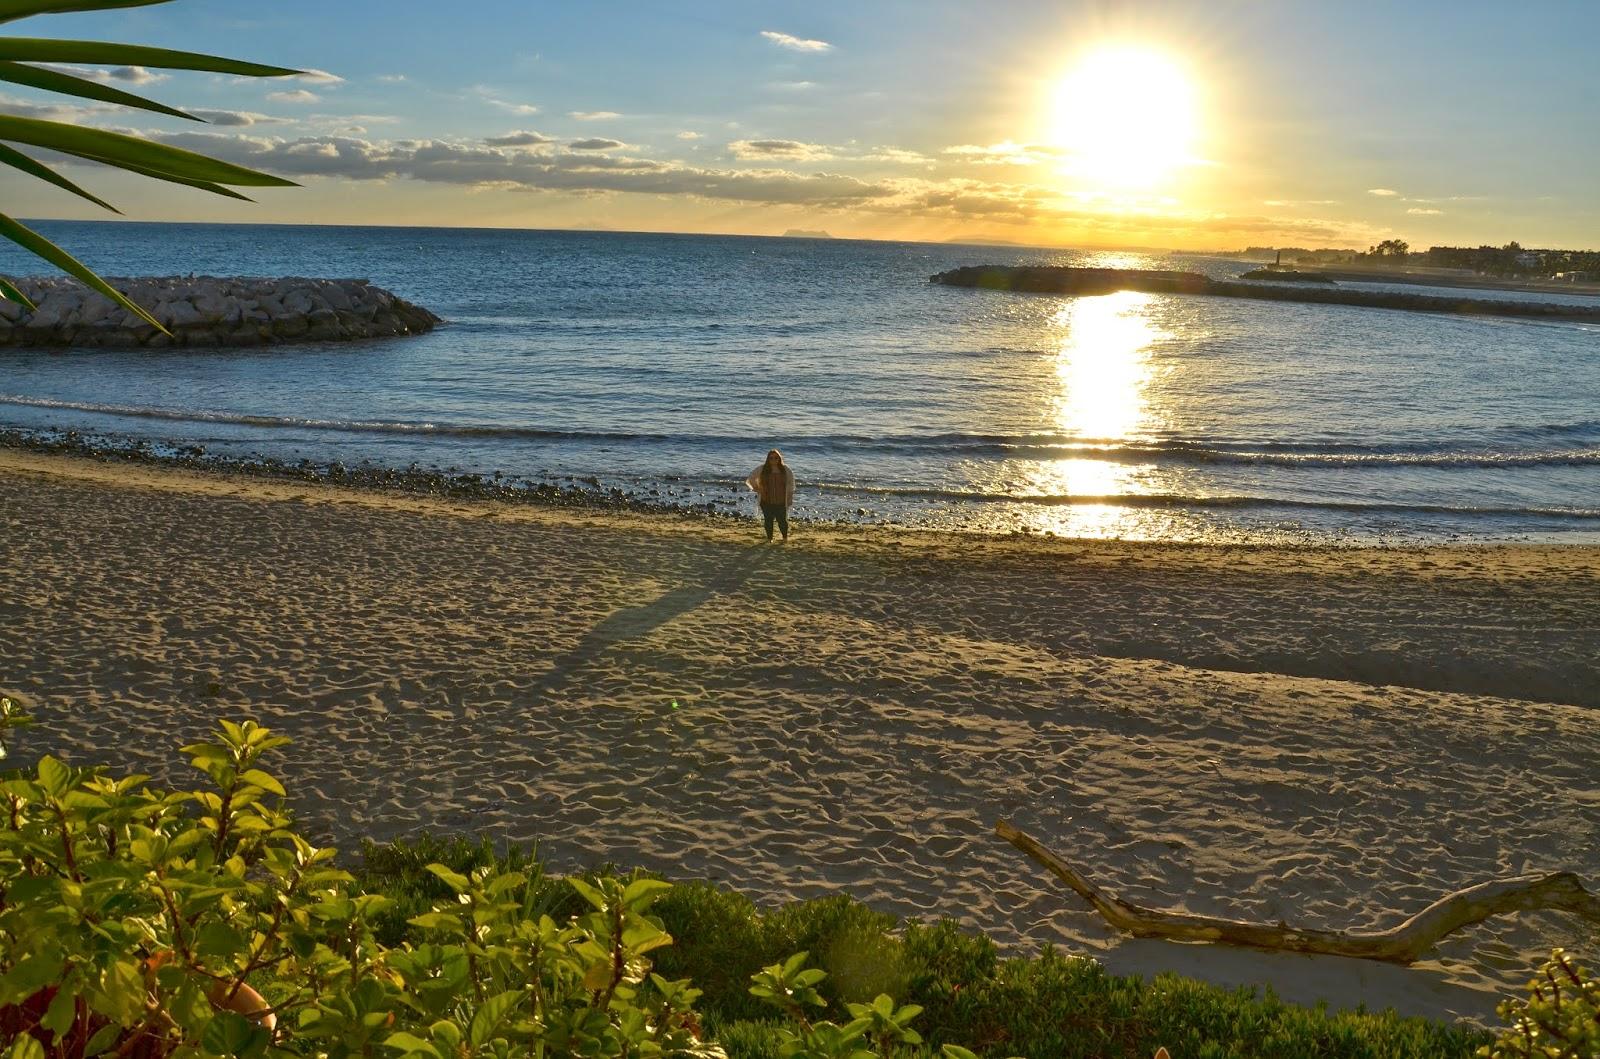 Silhouette Sunset Puerto Banus JustMelKate